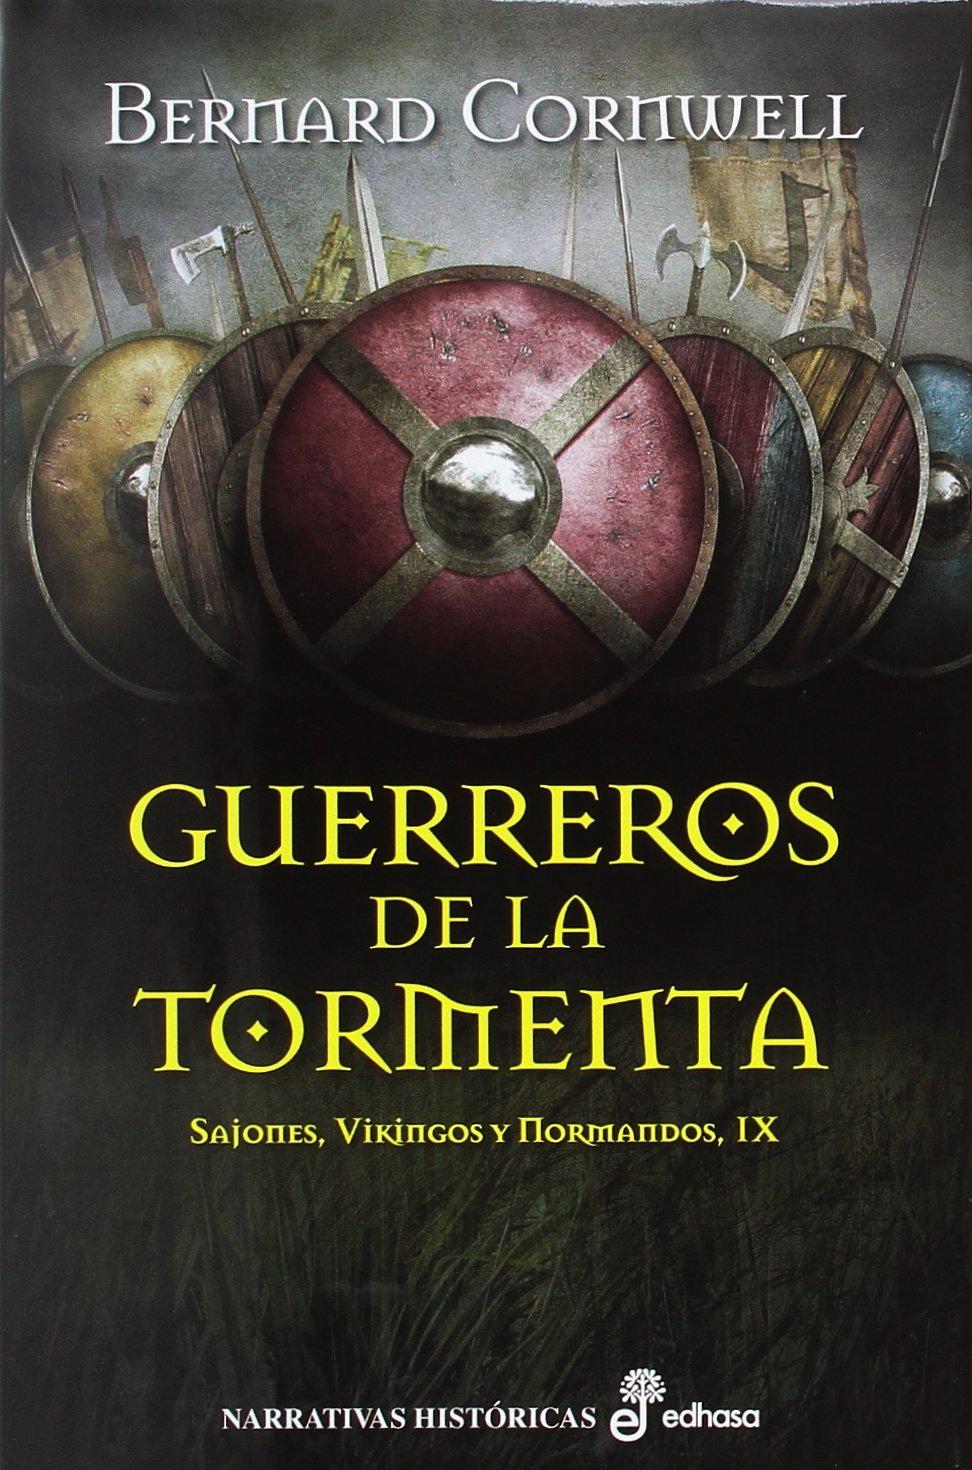 Guerreros de la tormenta (IX): Sajones, vikingos y normandos (Narrativas históricas) Tapa dura – 1 mar 2017 Bernard Cornwell Gregorio Cantera Chamorro S.A. 8435063089